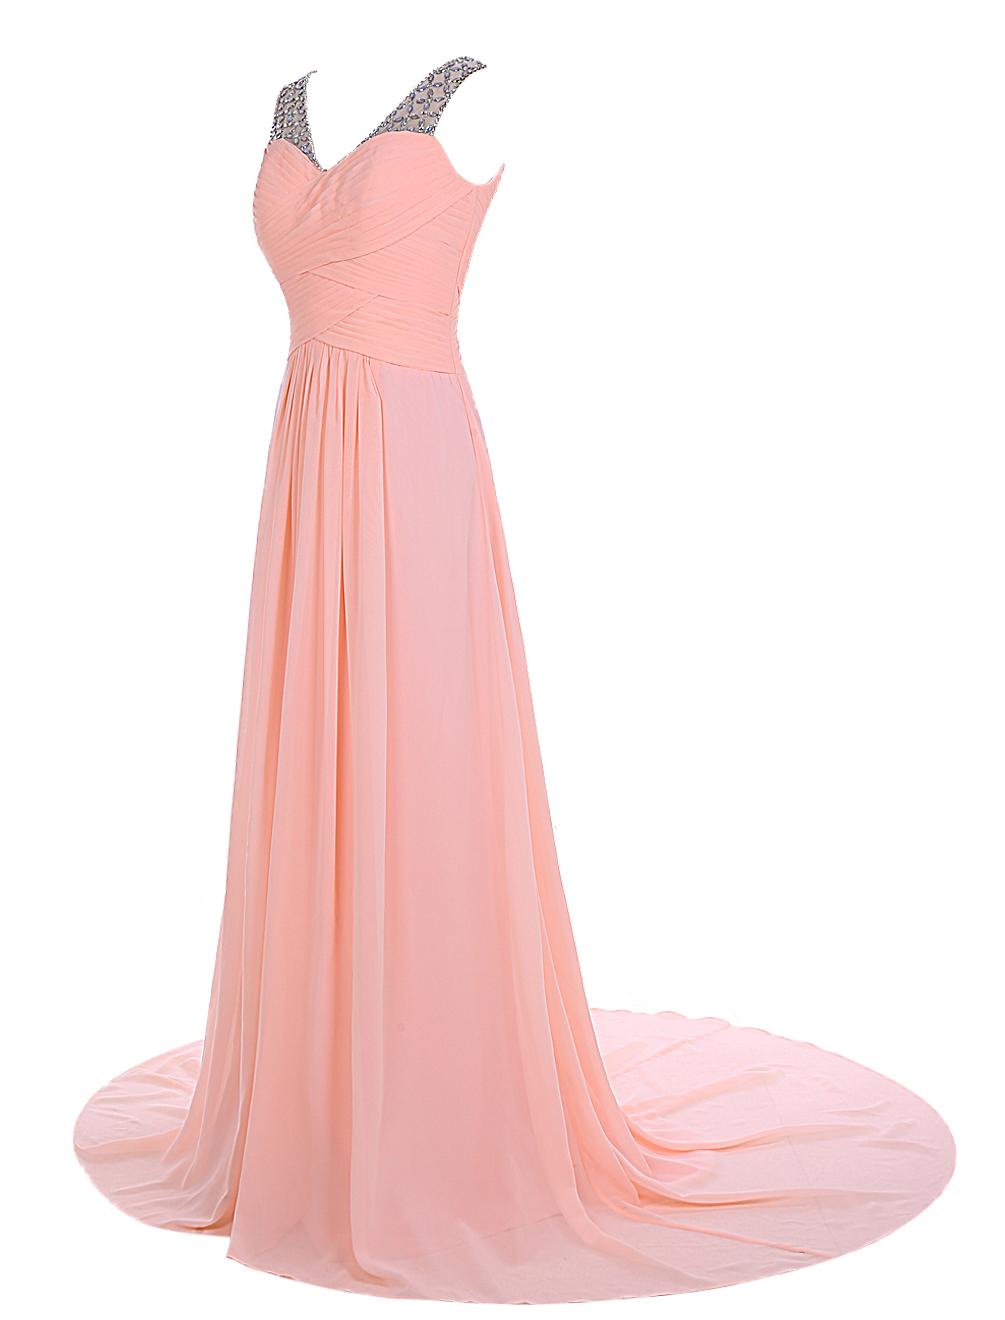 Elegant A-line Sweep Train V-neck Chiffon Beading Pink Prom Dress Evening Gowns фото